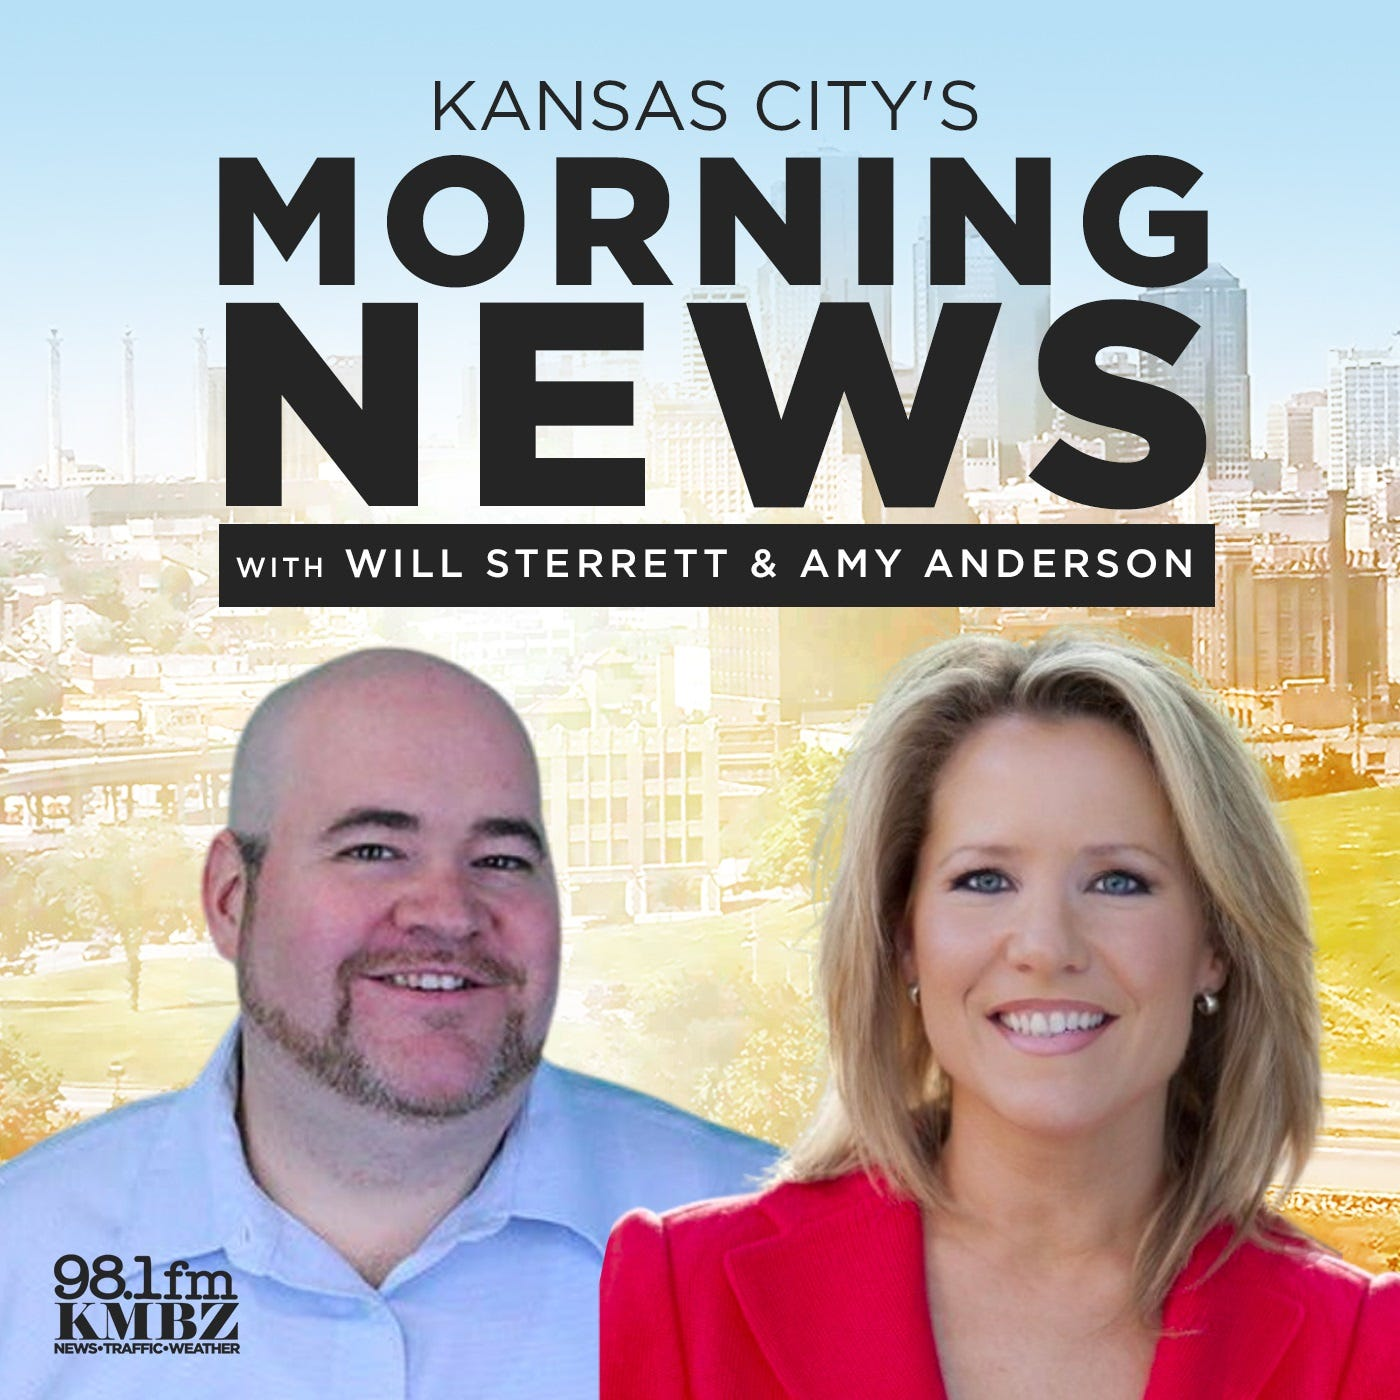 Kansas City's Morning News